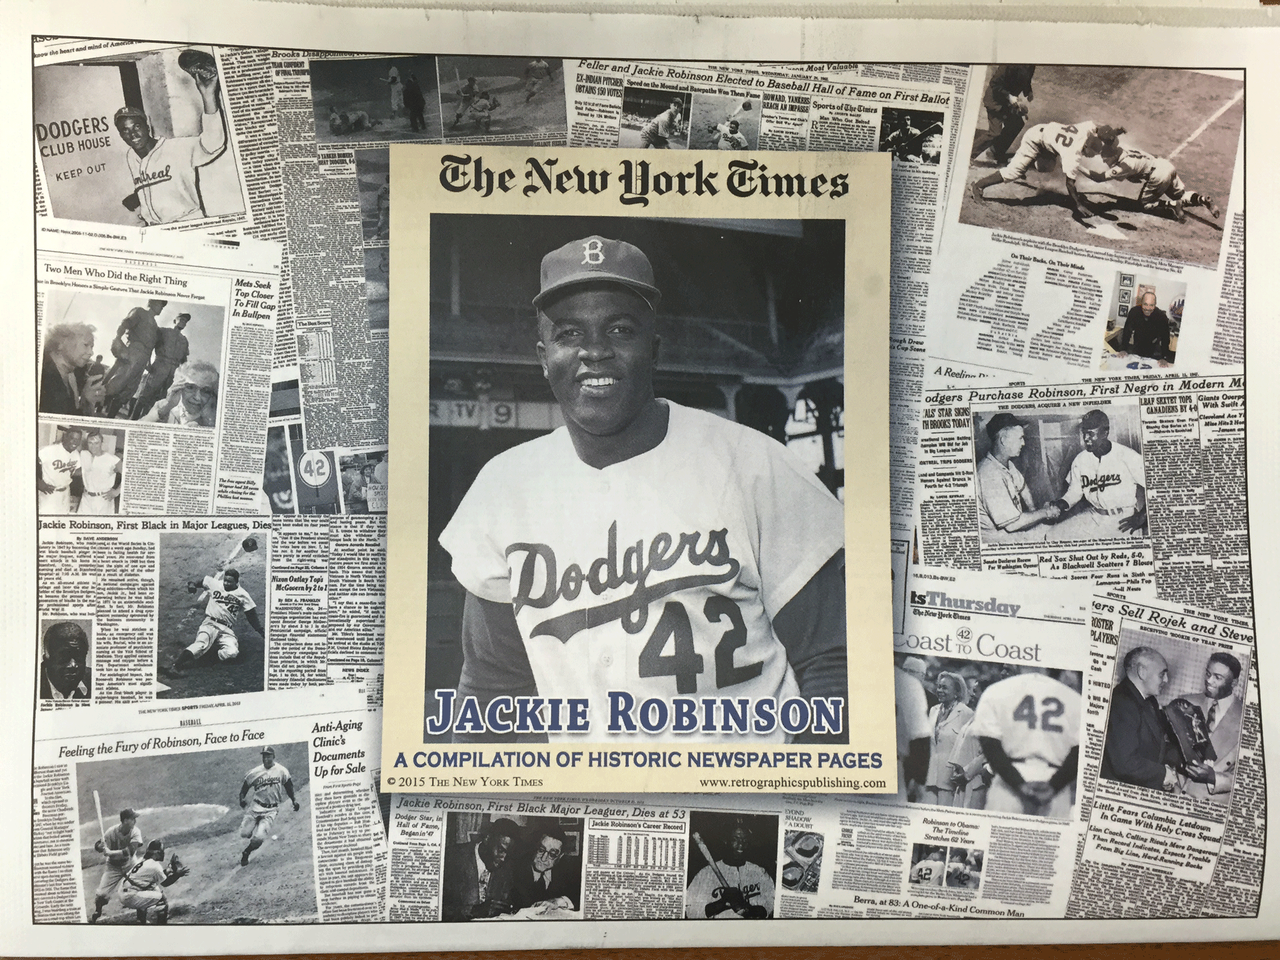 Jackie Robinson Historic Newspaper Compilation - NY Times photo